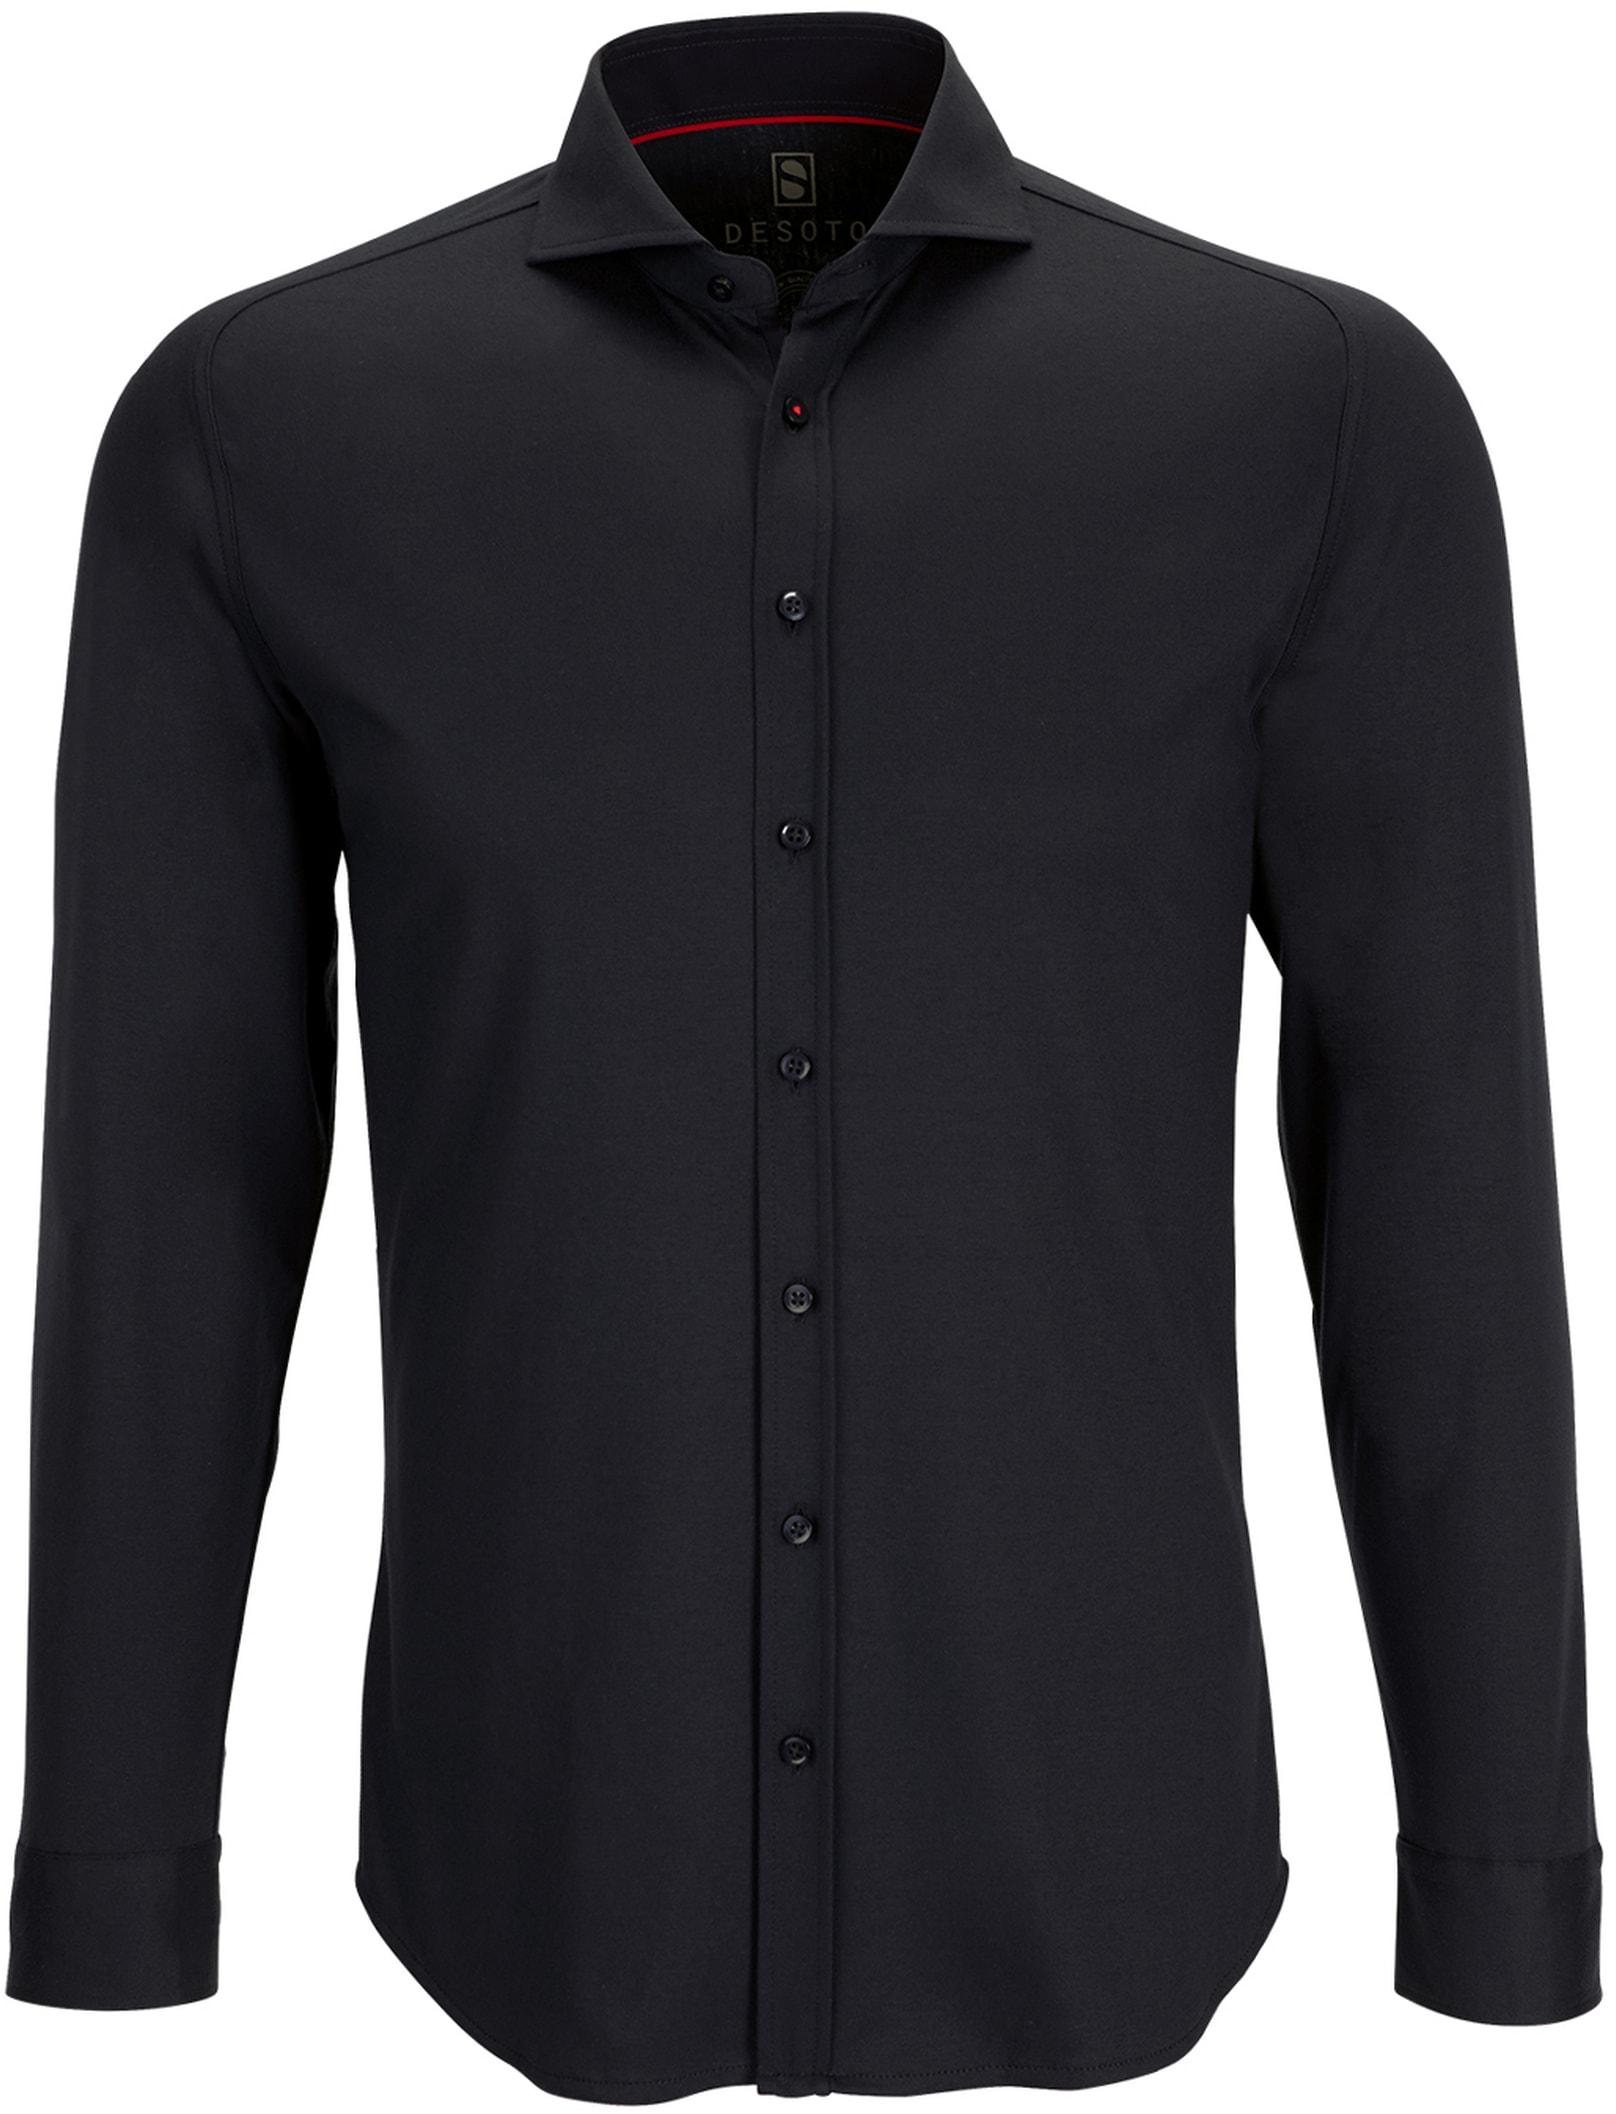 Desoto Overhemd Strijkvrij Zwart foto 0